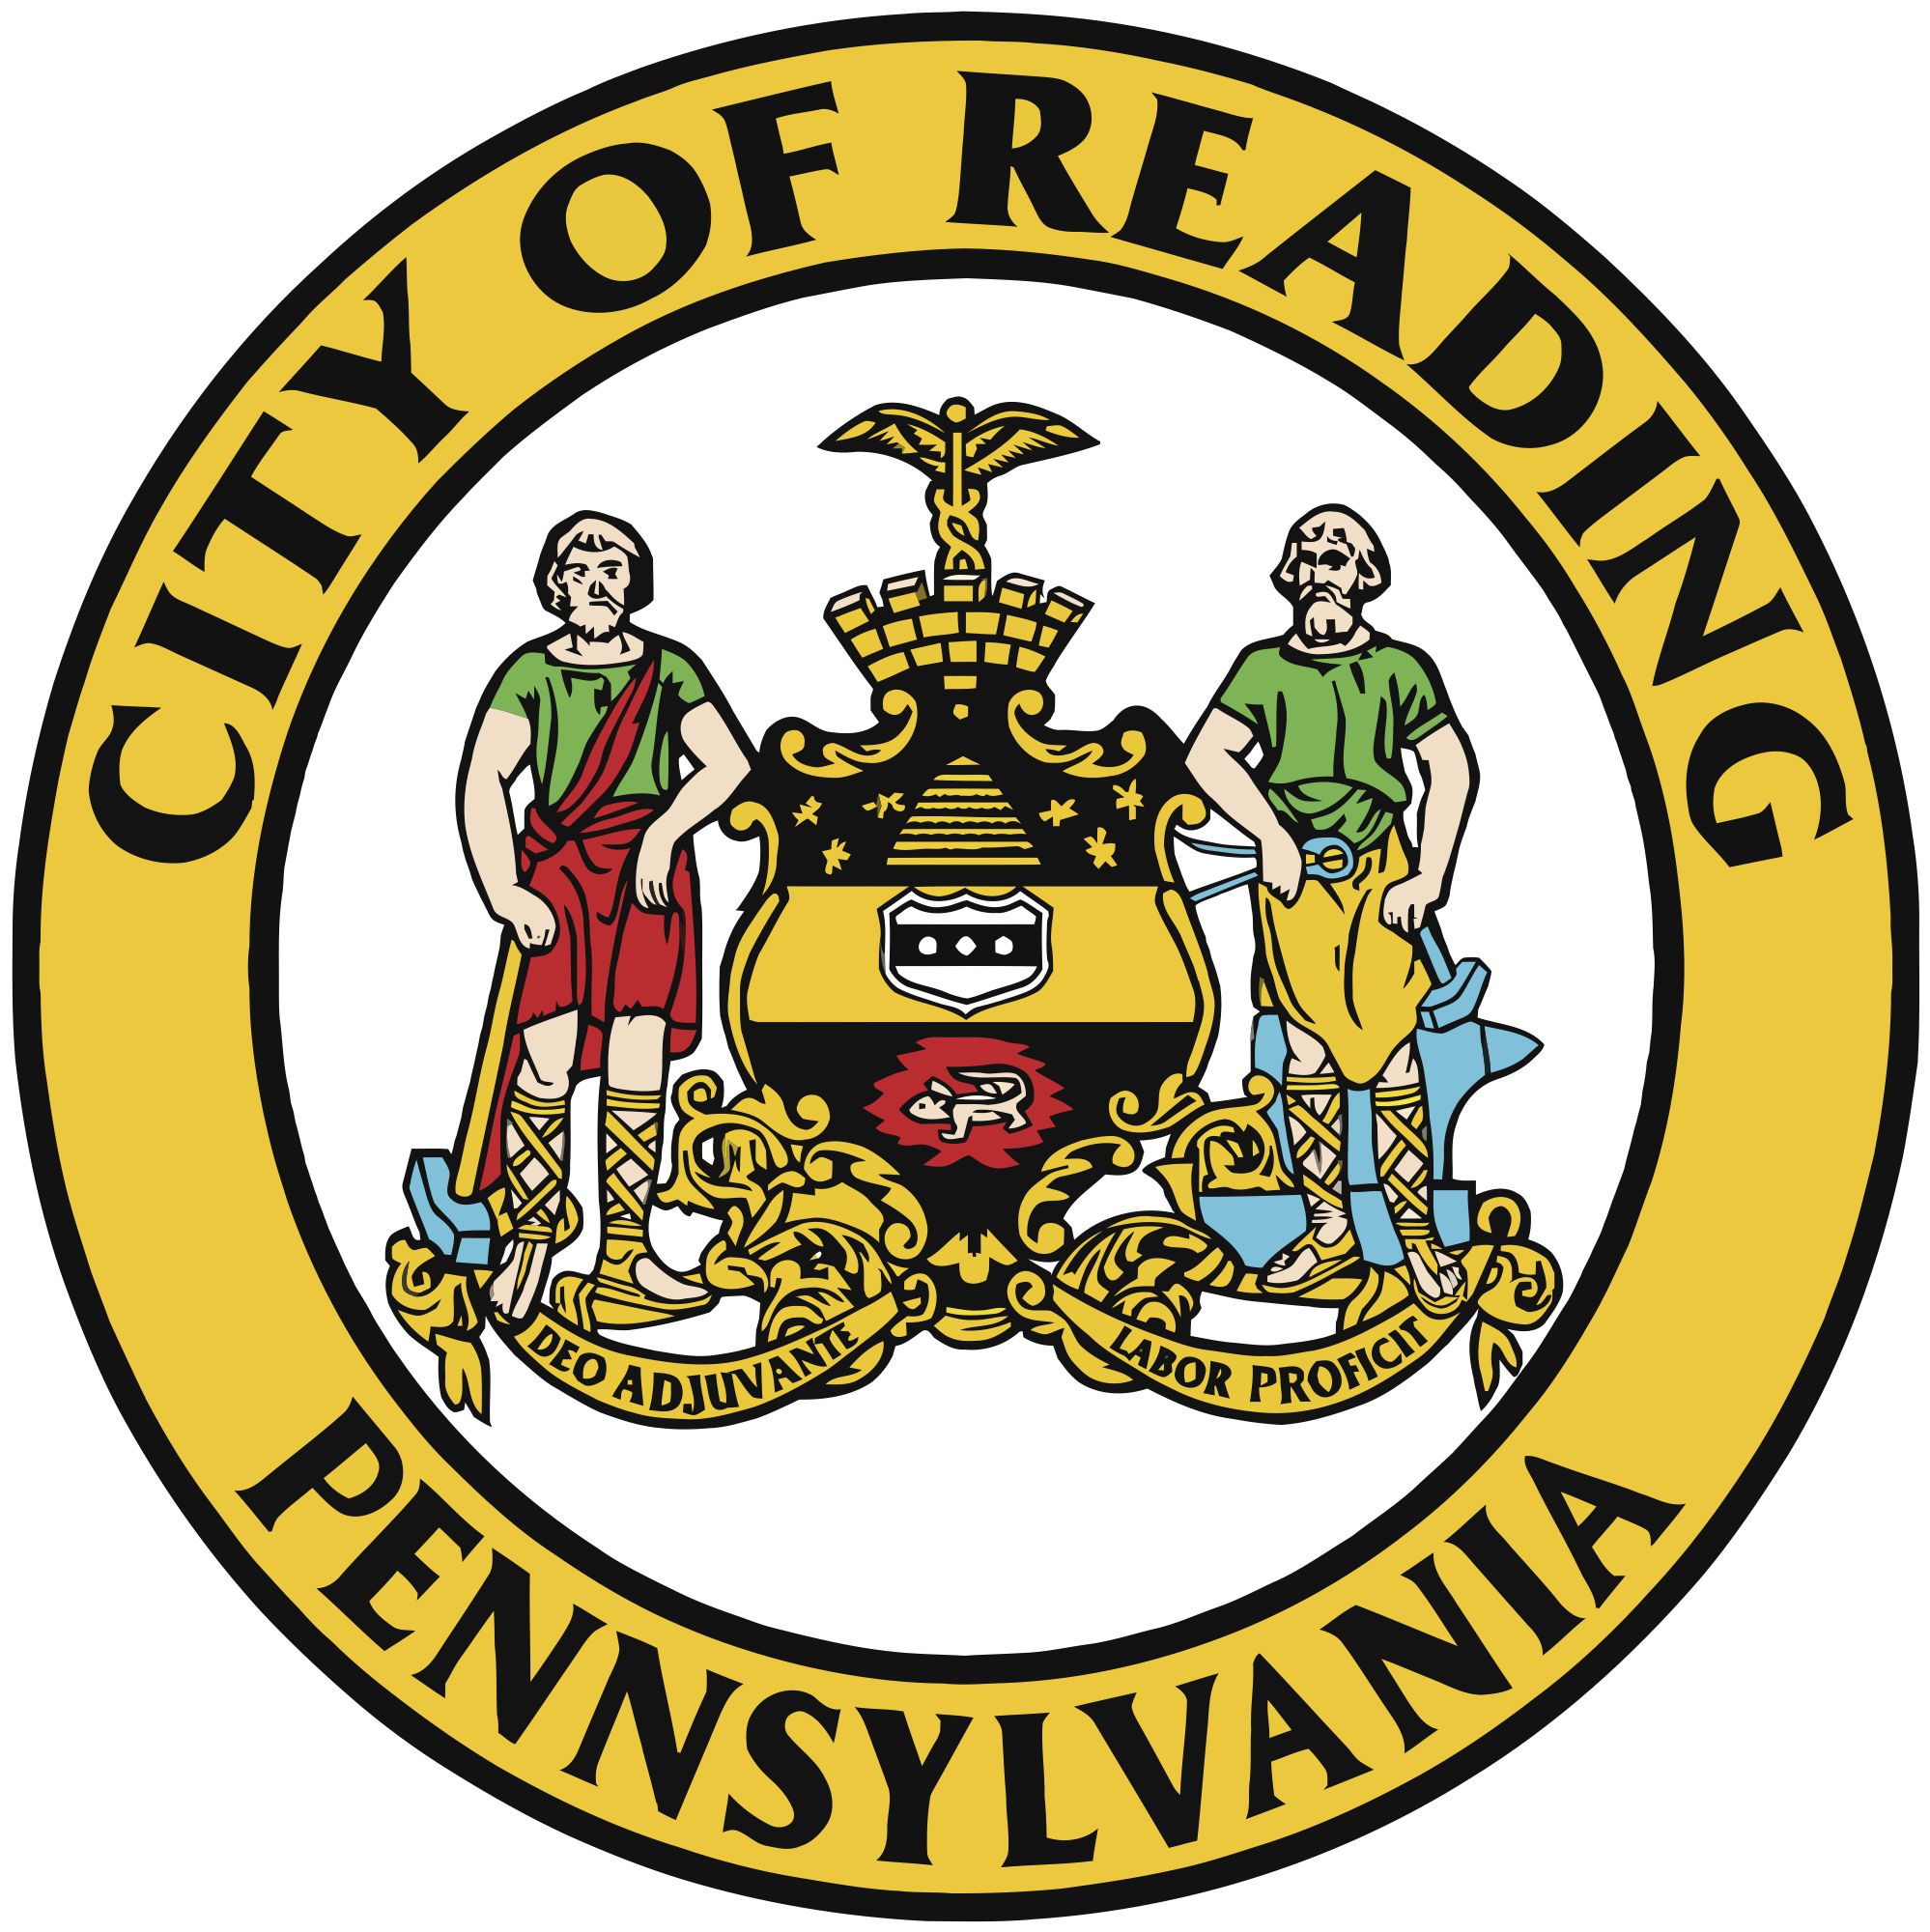 cityofreadinglogoretorocle.jpg